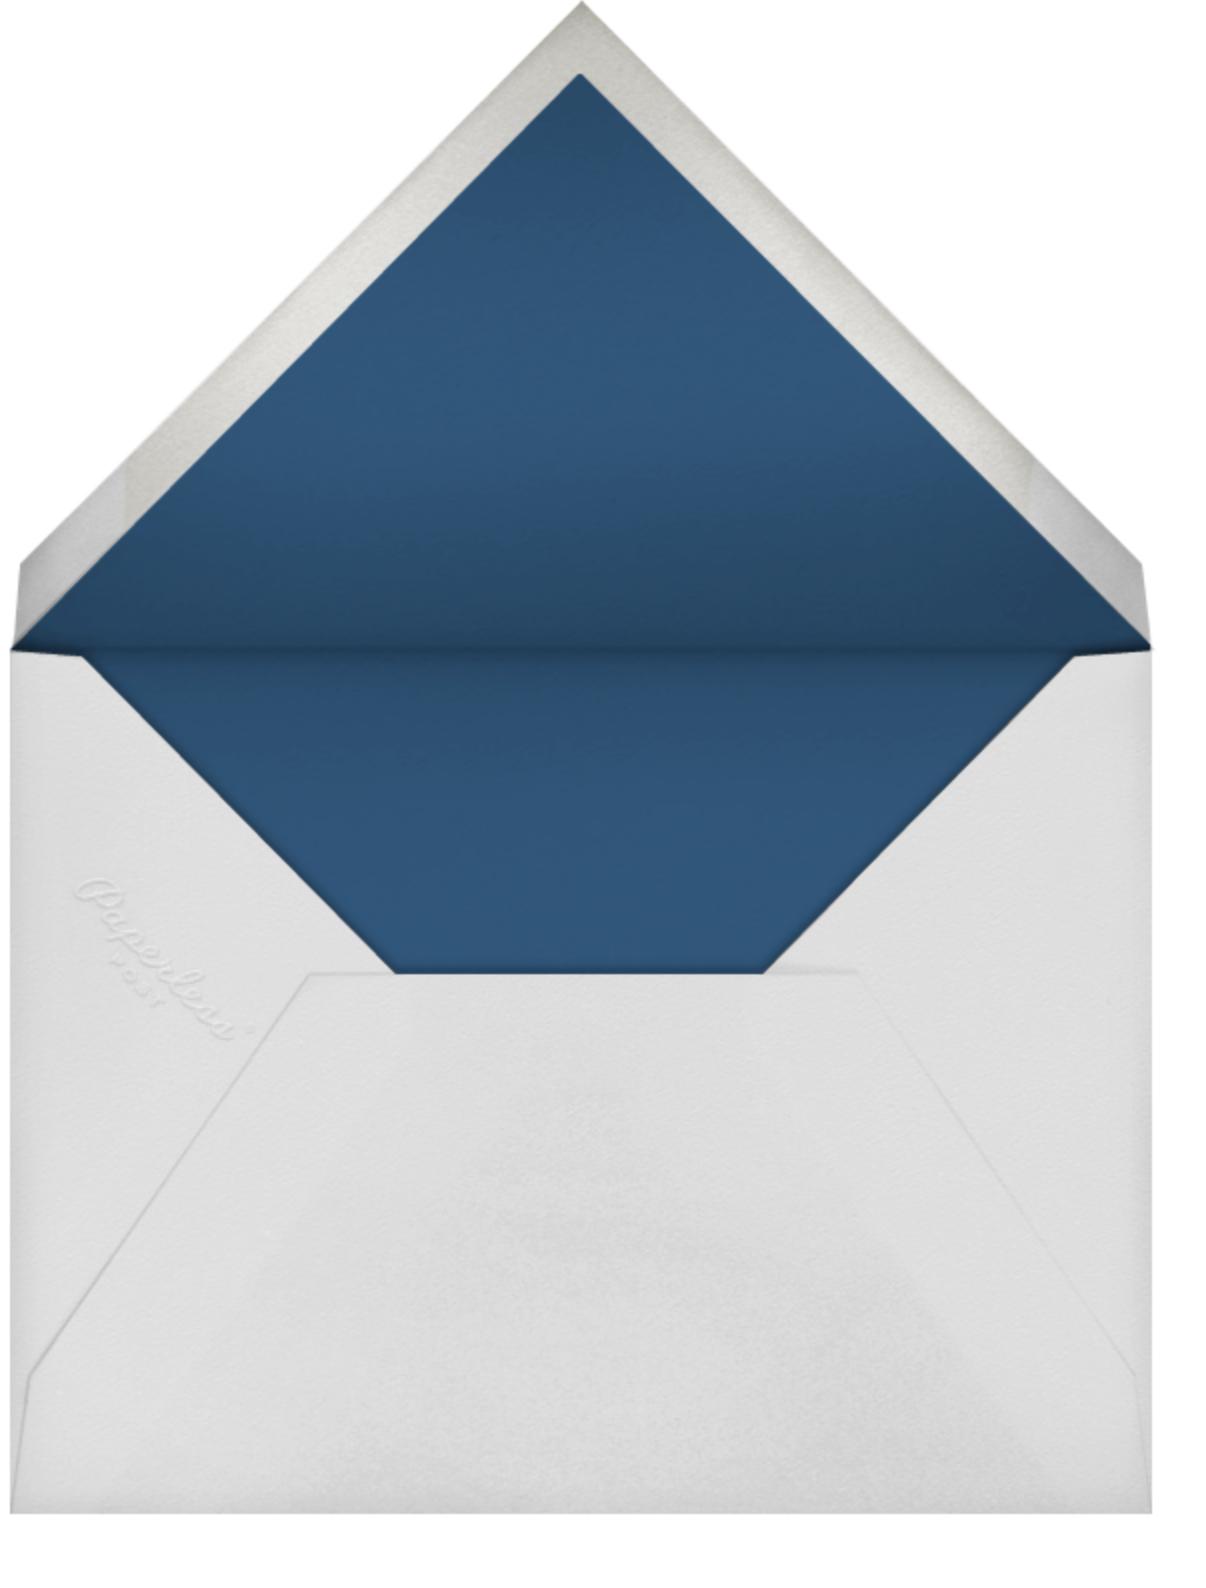 Belle Boulevard (Stationery) - Silver - kate spade new york - Personalized stationery - envelope back